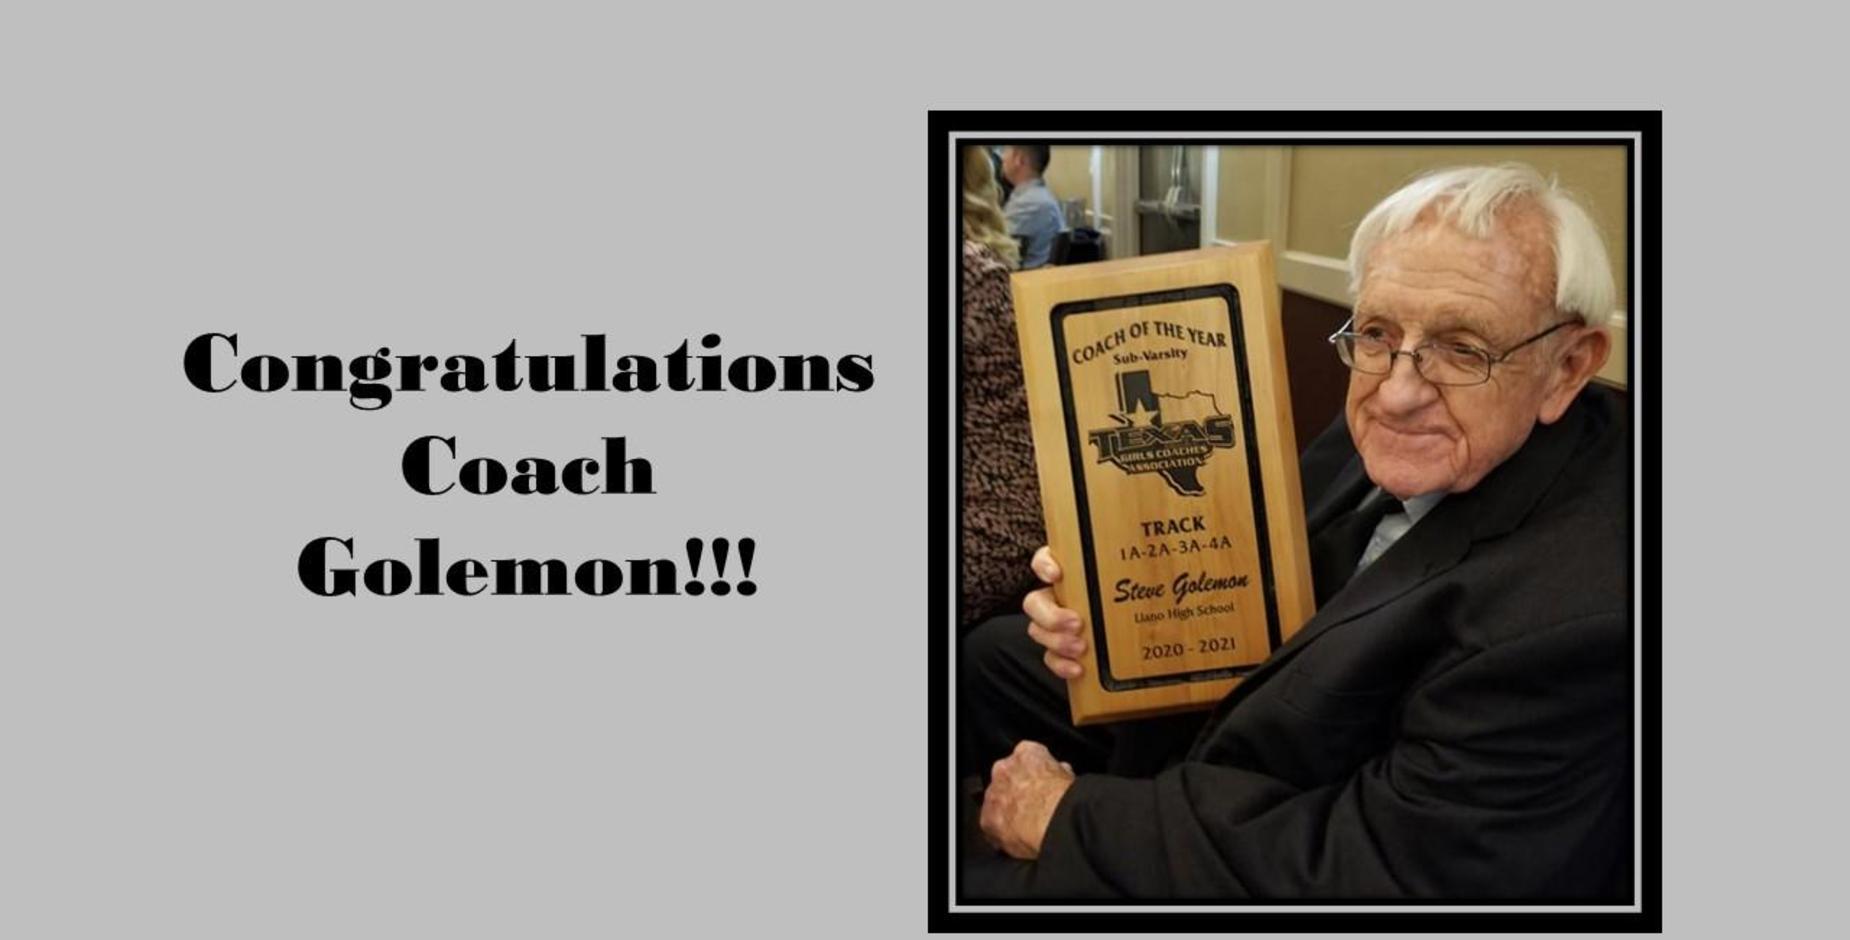 Congrats Coach Golemon